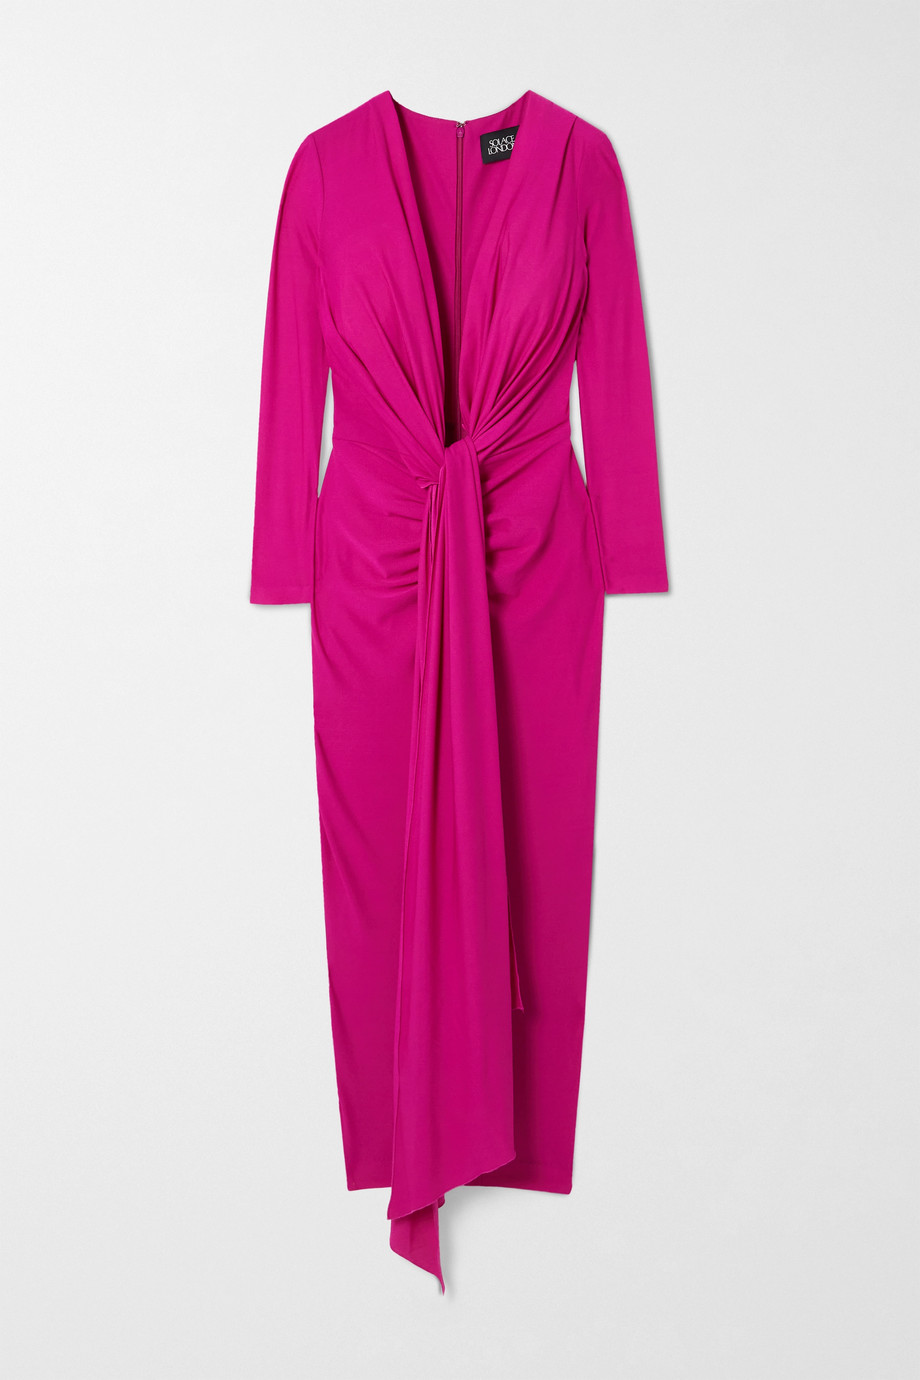 Solace London Robe midi nouée sur le devant en crêpe stretch Lorena